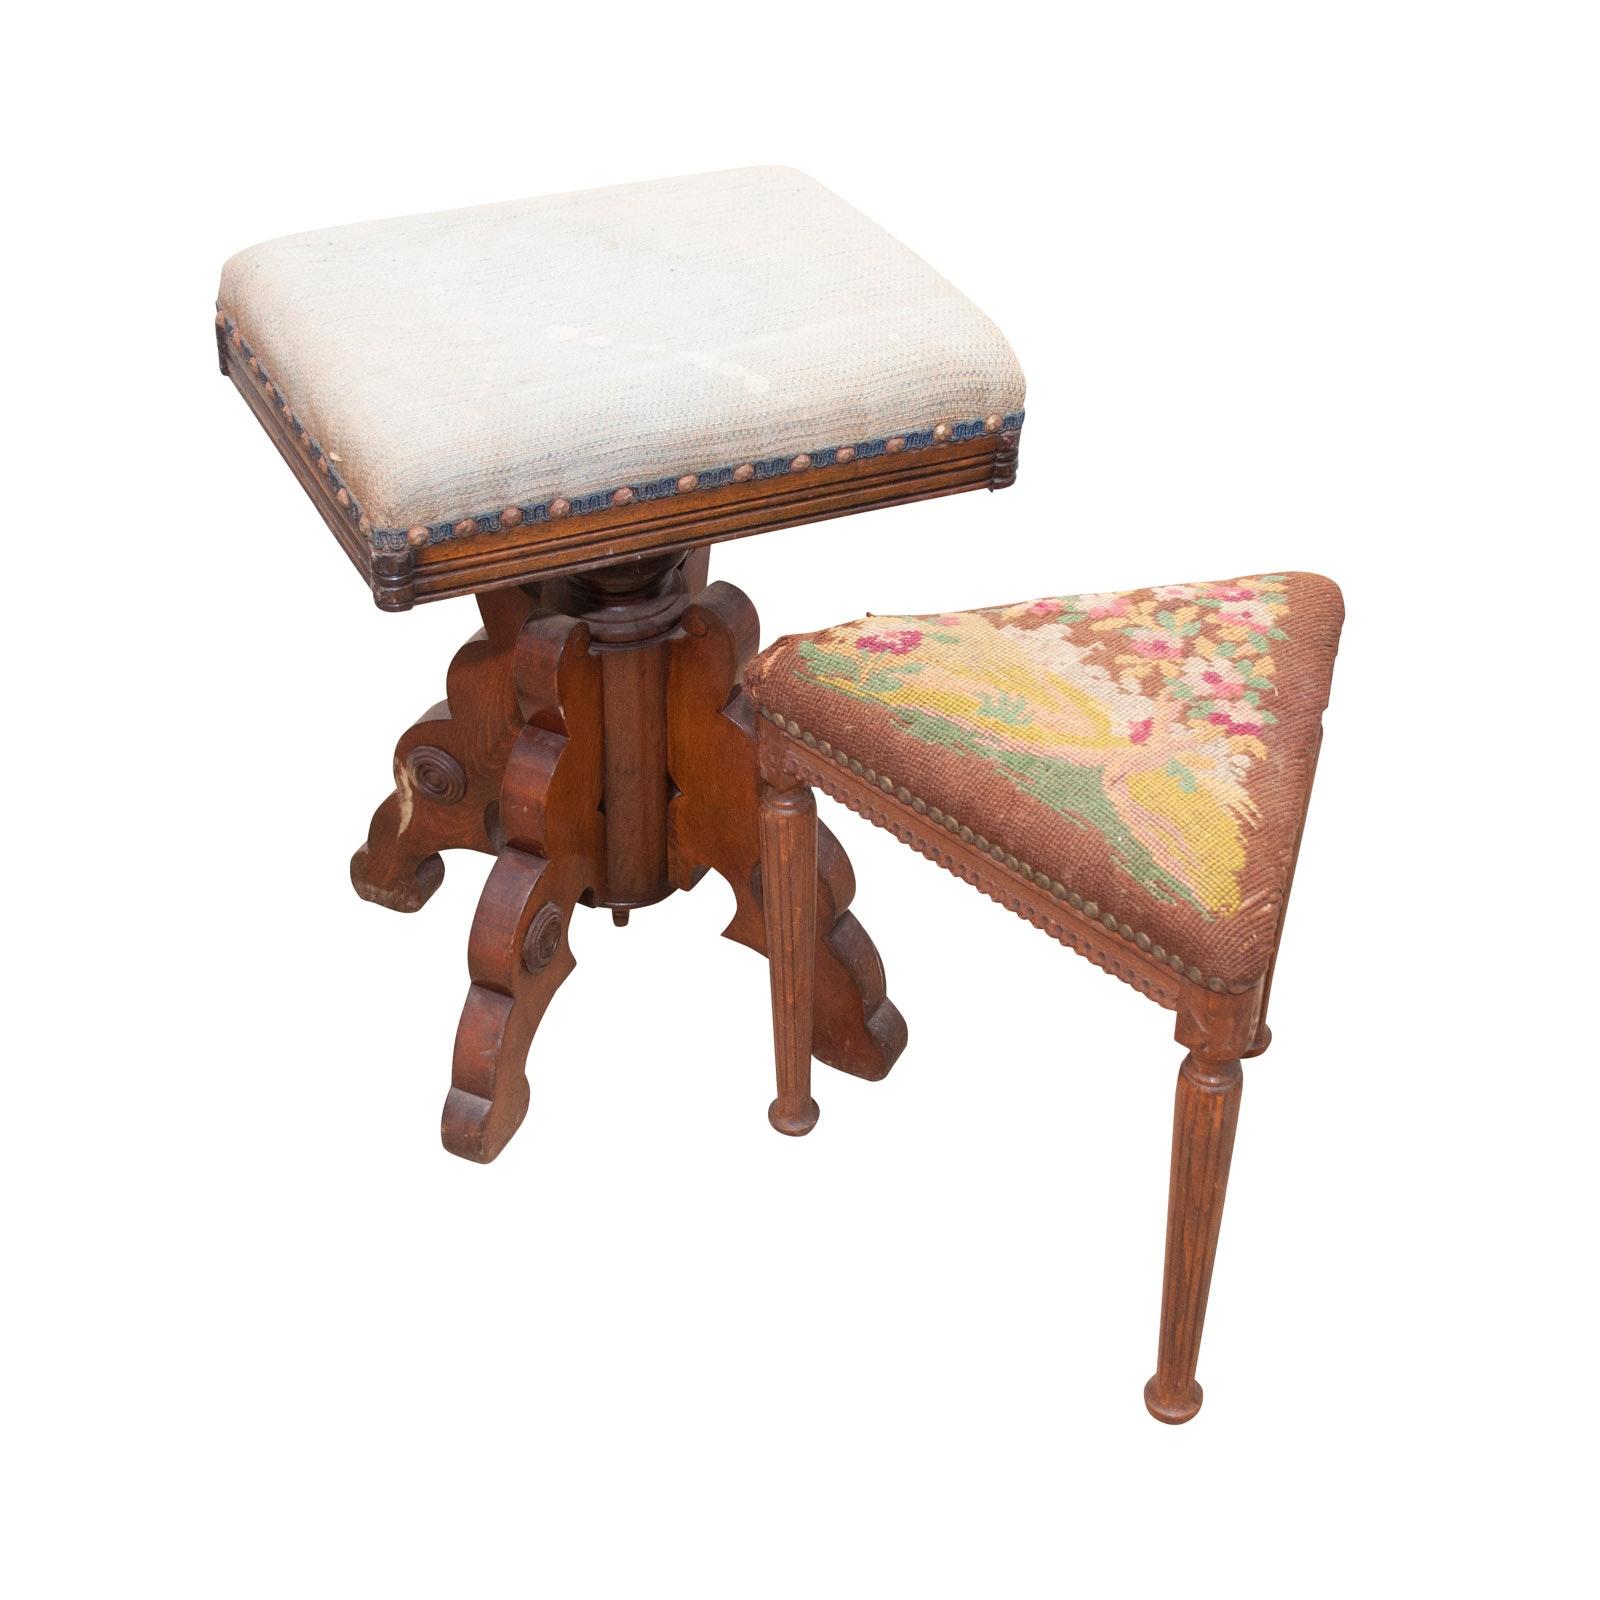 Victorian Walnut Stool and Federal Style Mahogany Footstool